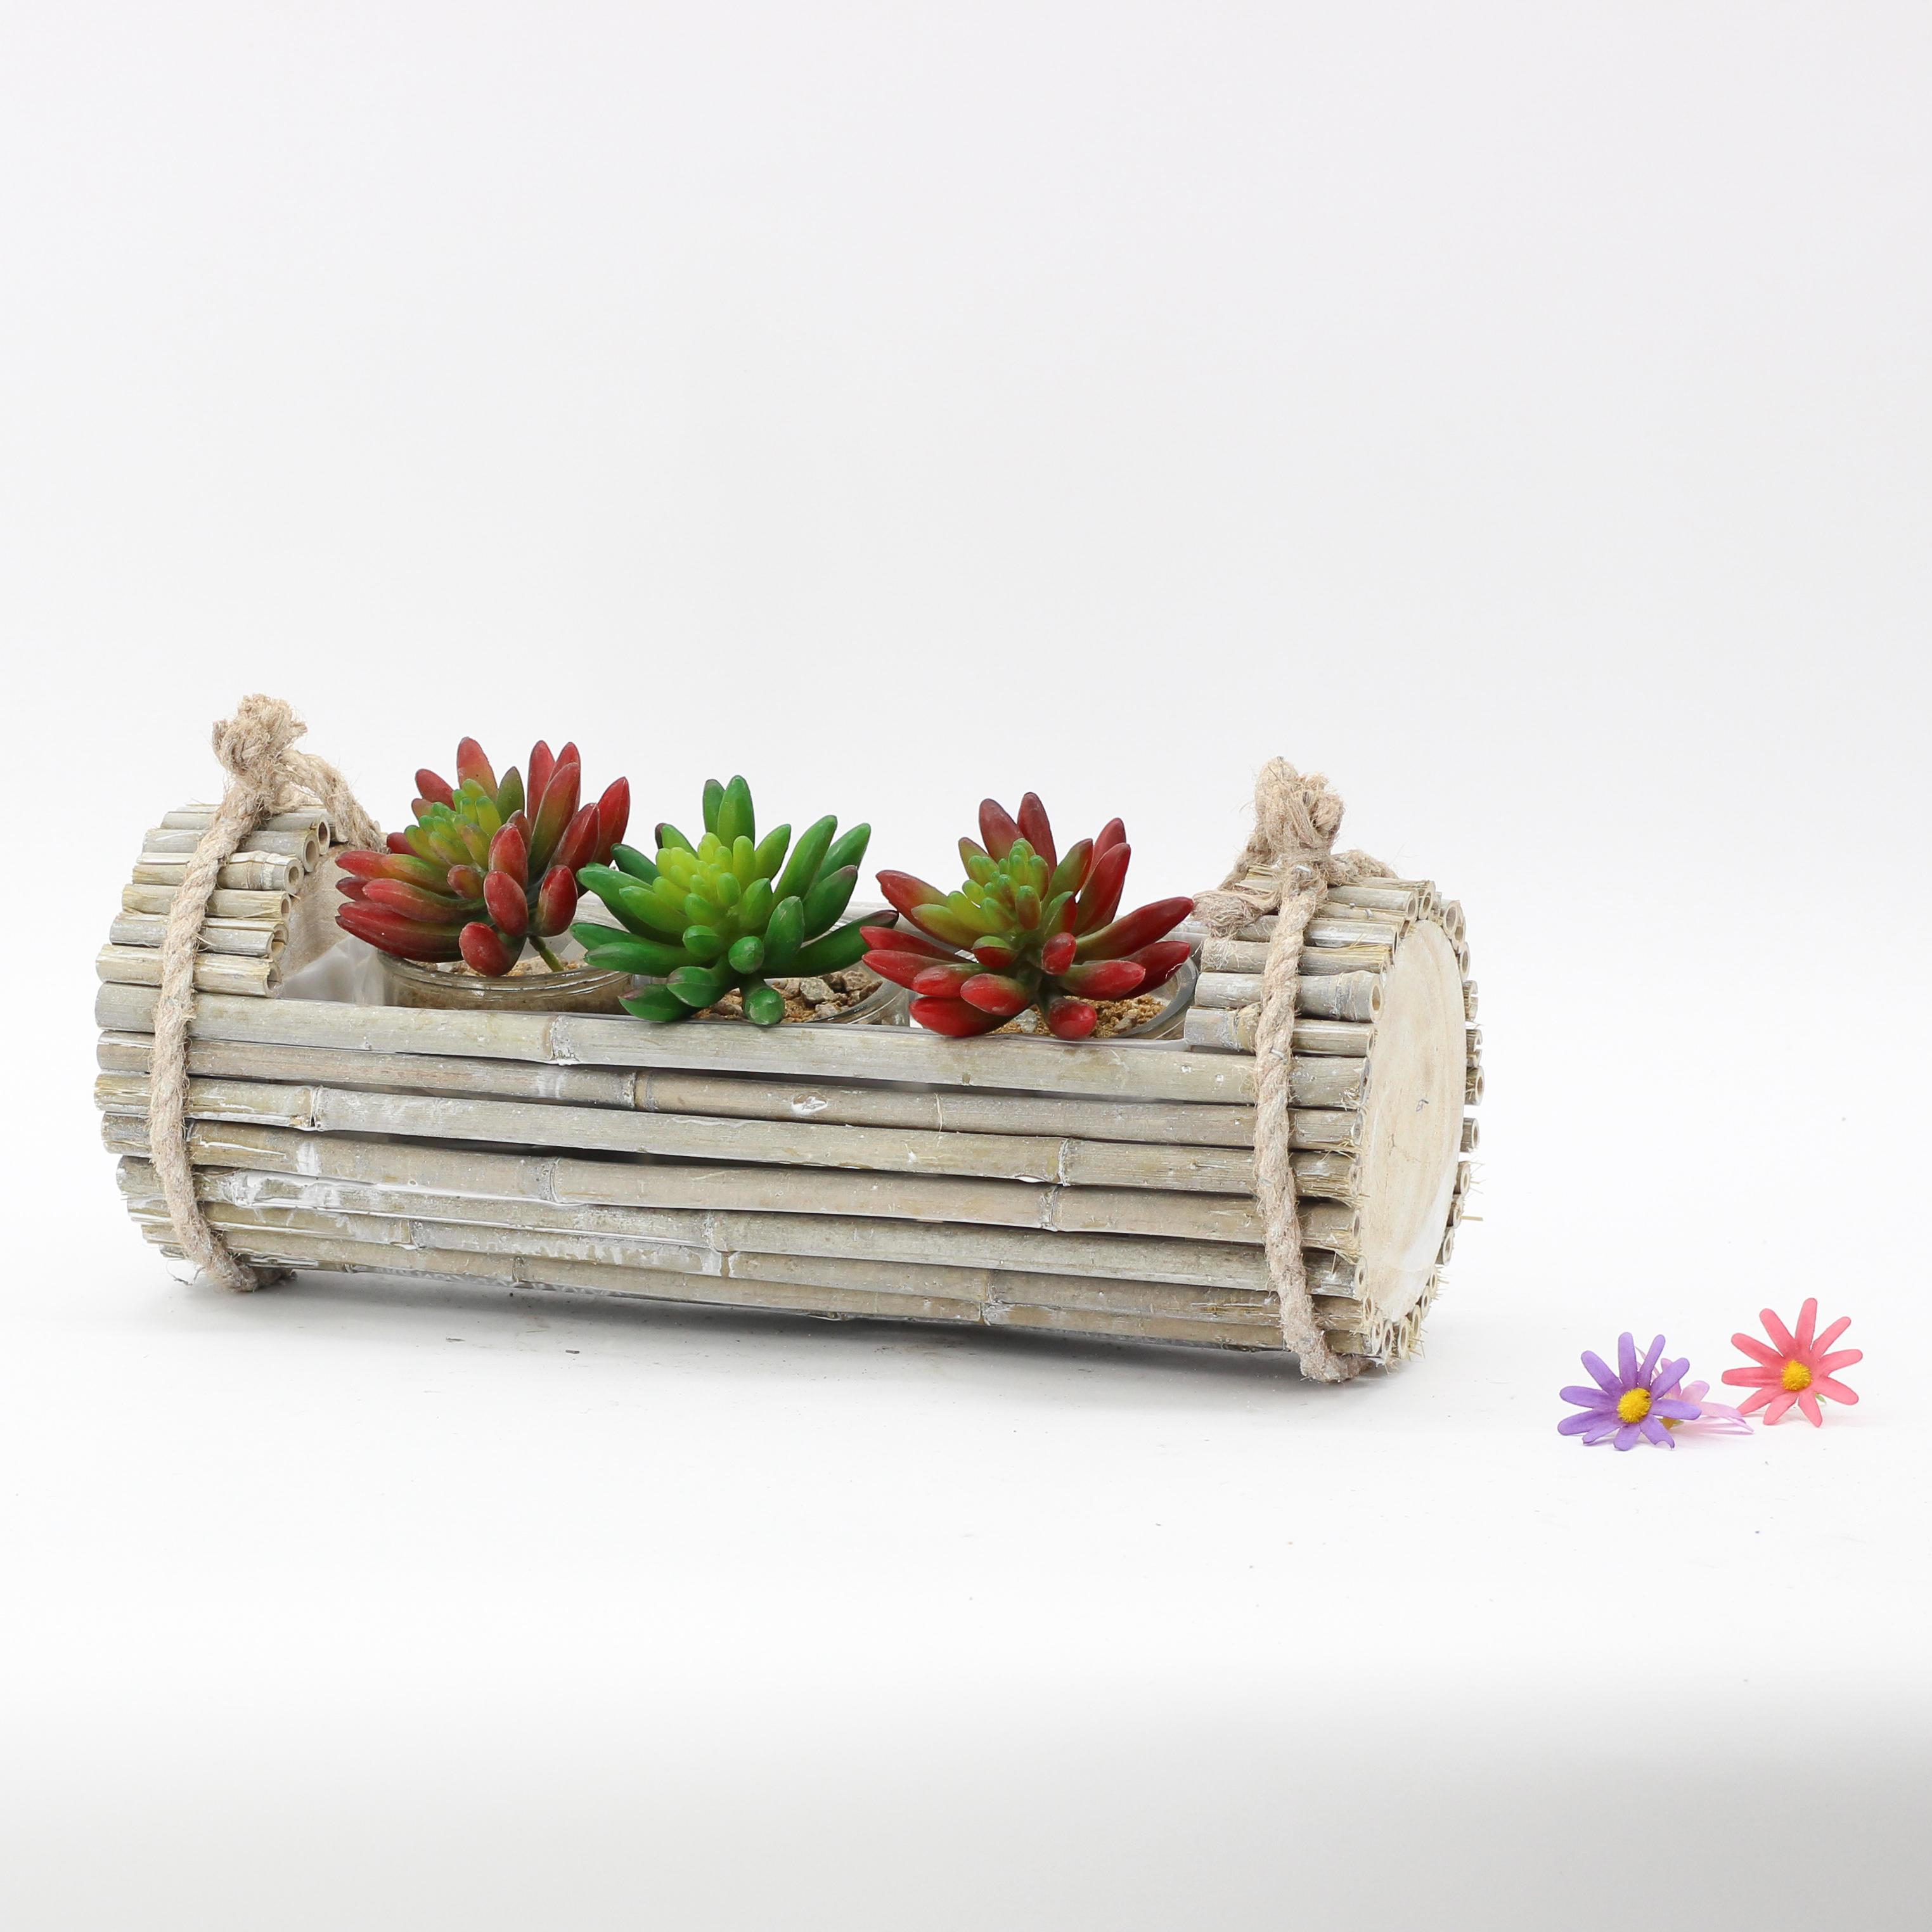 Maceta de madera para plantar en casa